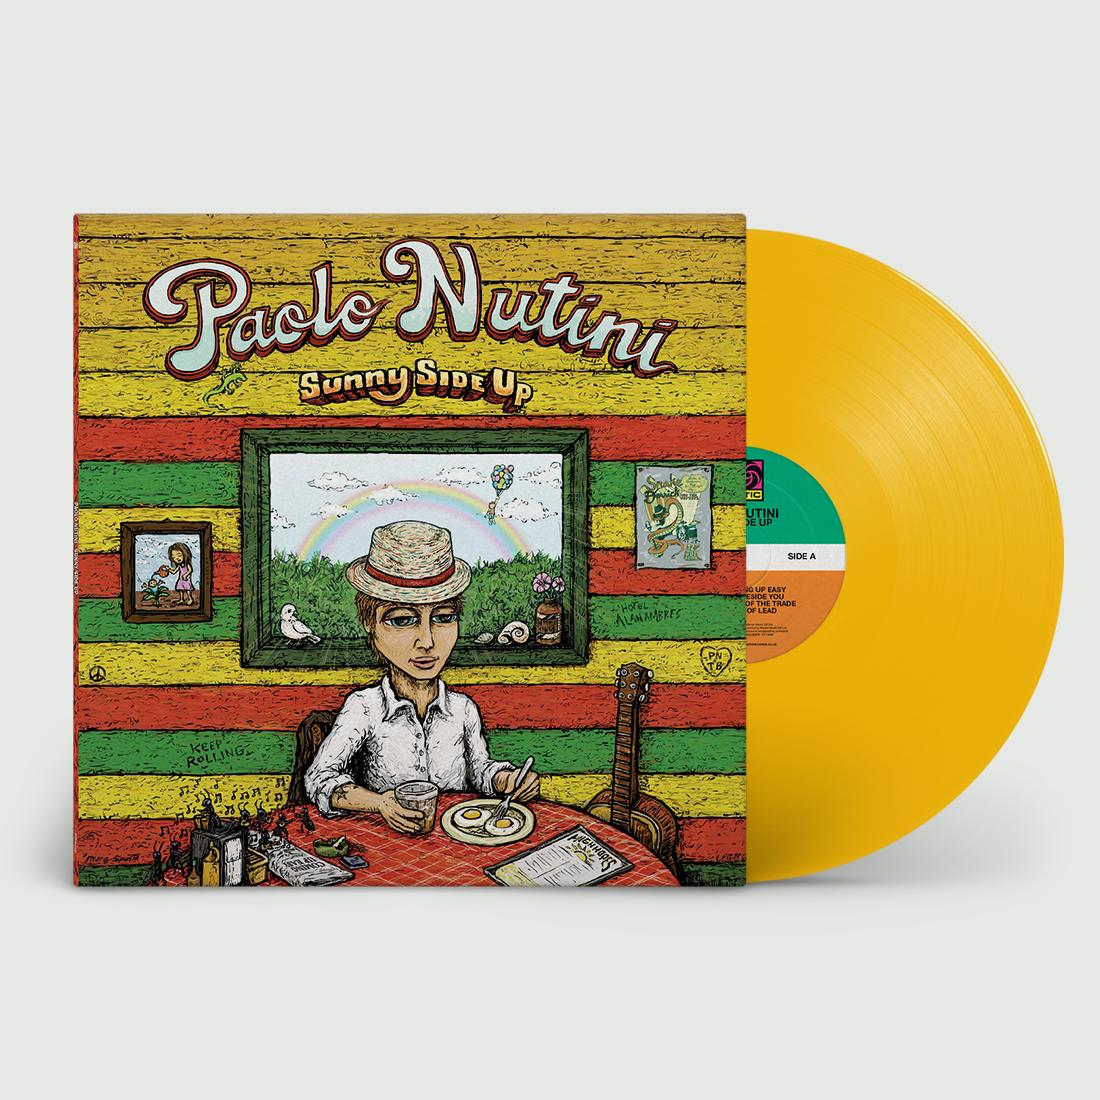 Paolo Nutini - Sunny Side Up Yellow Vinyl